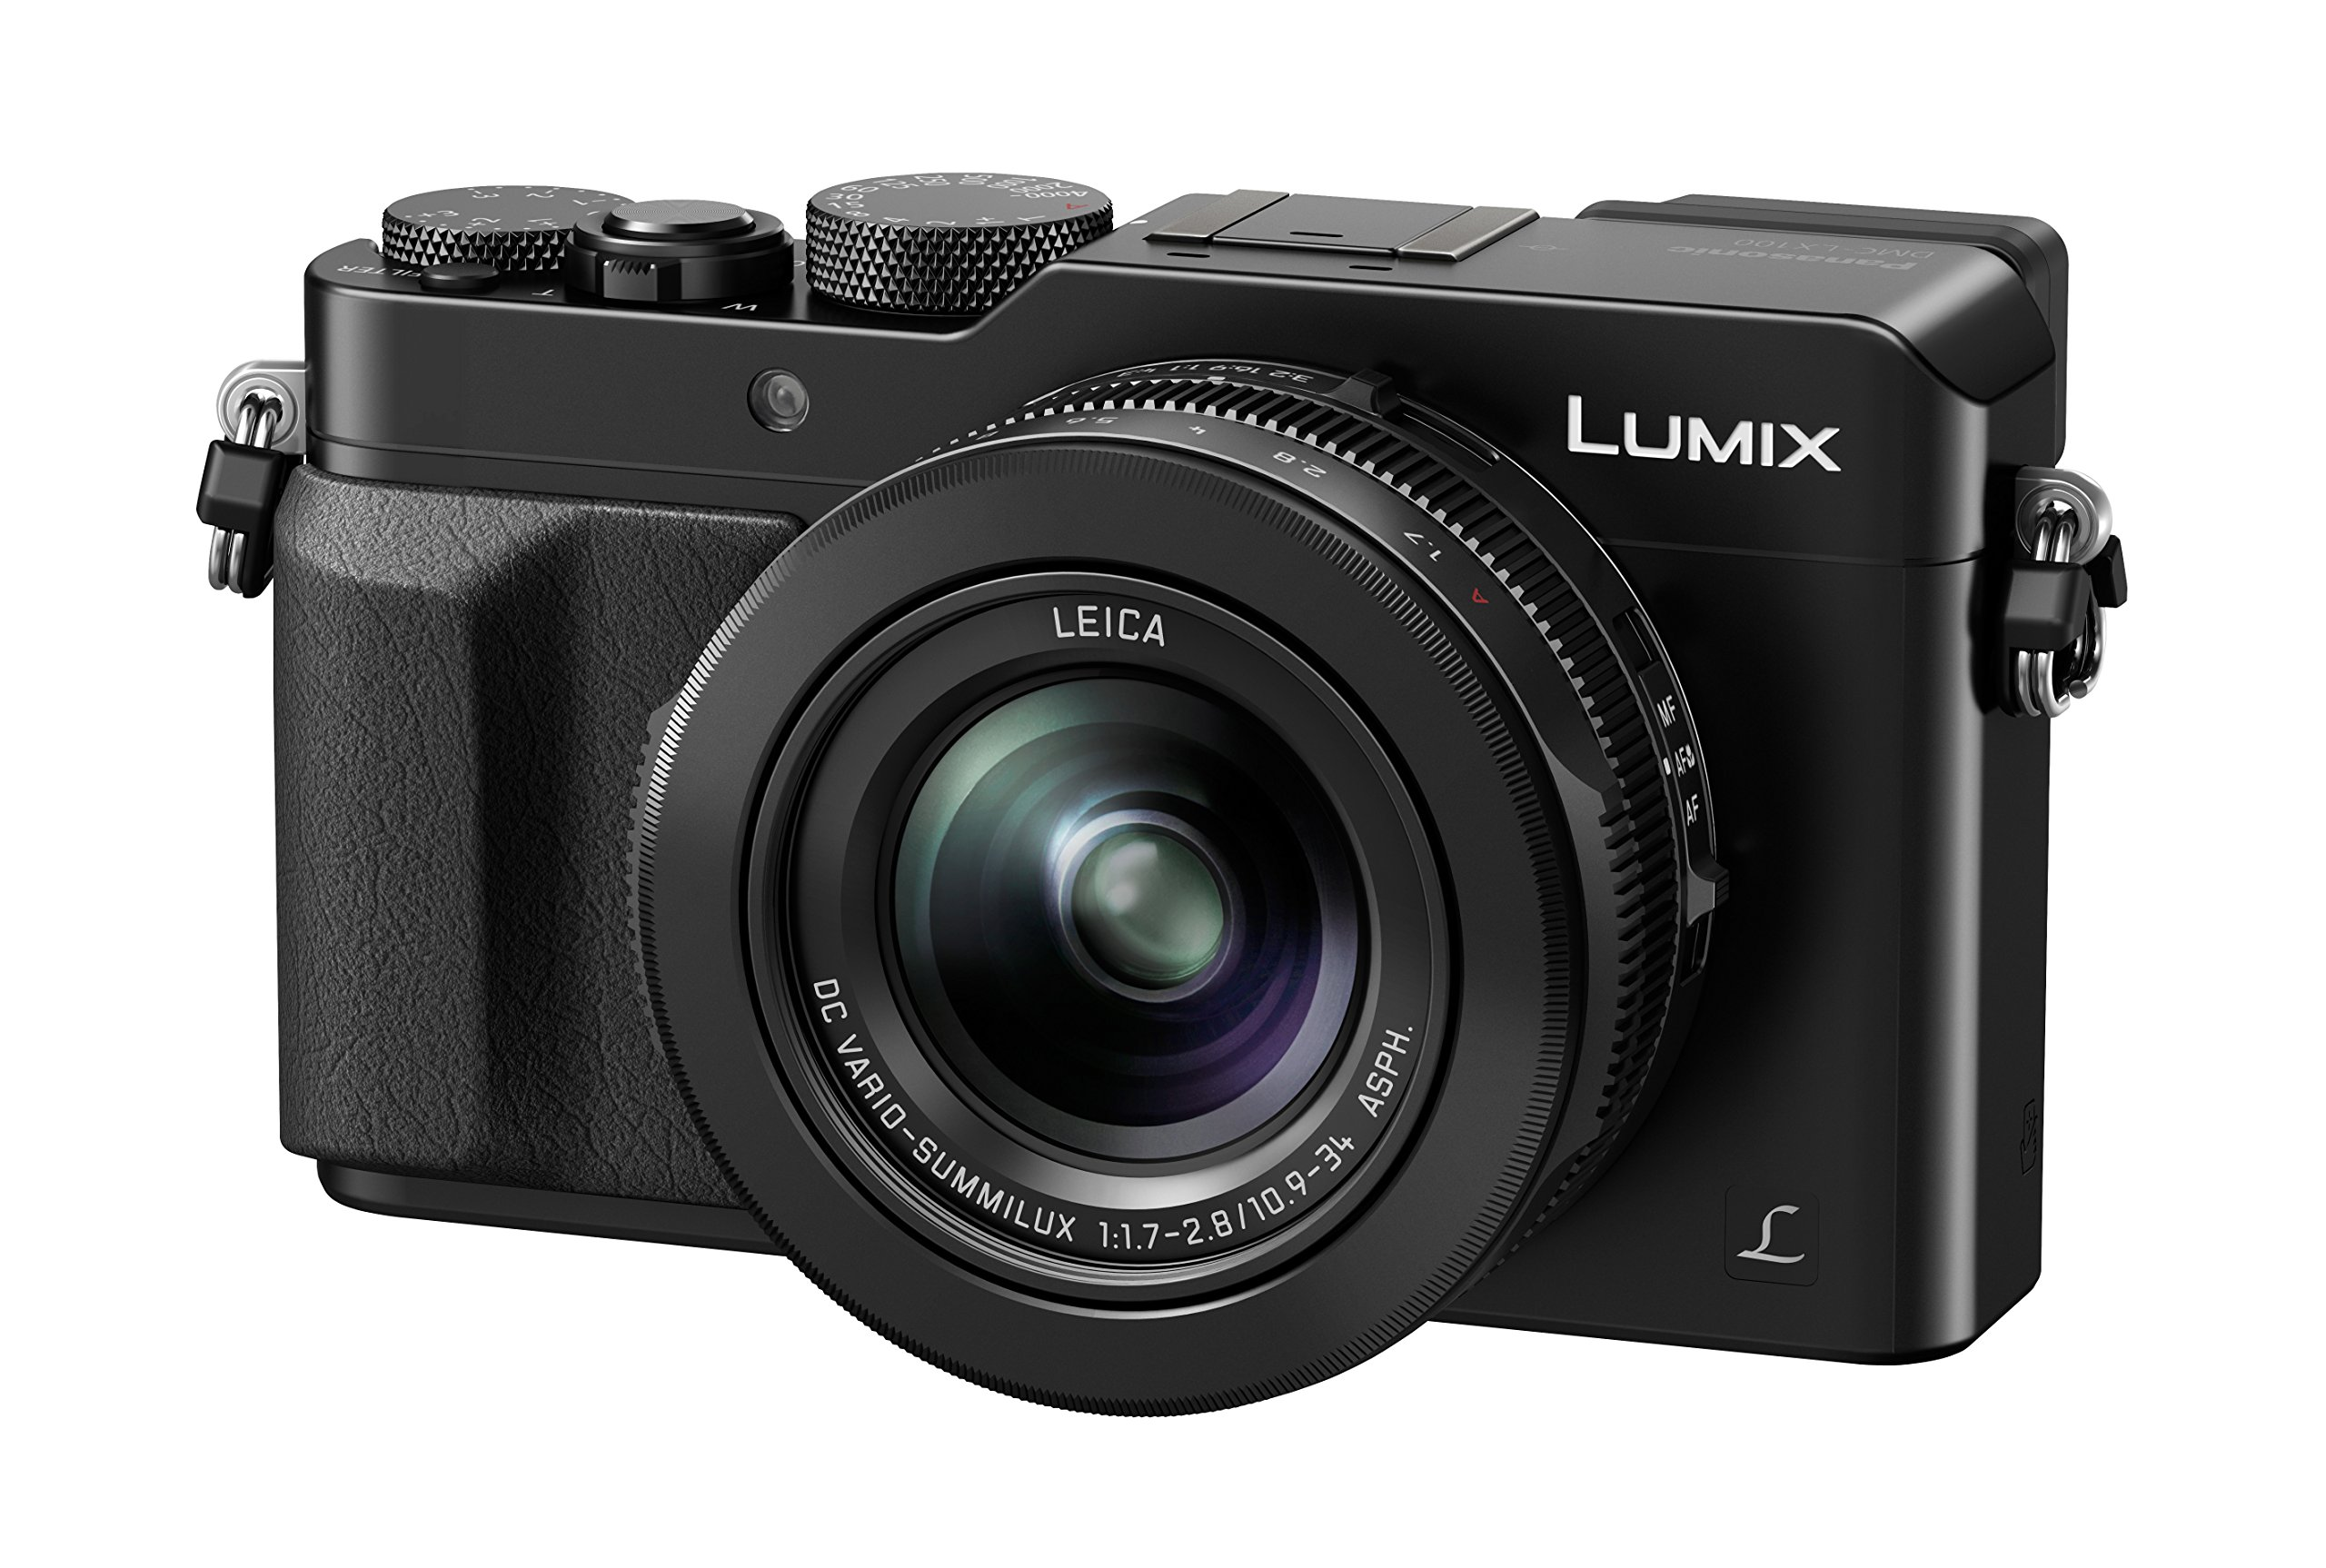 Panasonic Lumix DMC-LX100 Fotocamera Digitale, 12.8 Megapixel, Nero product image